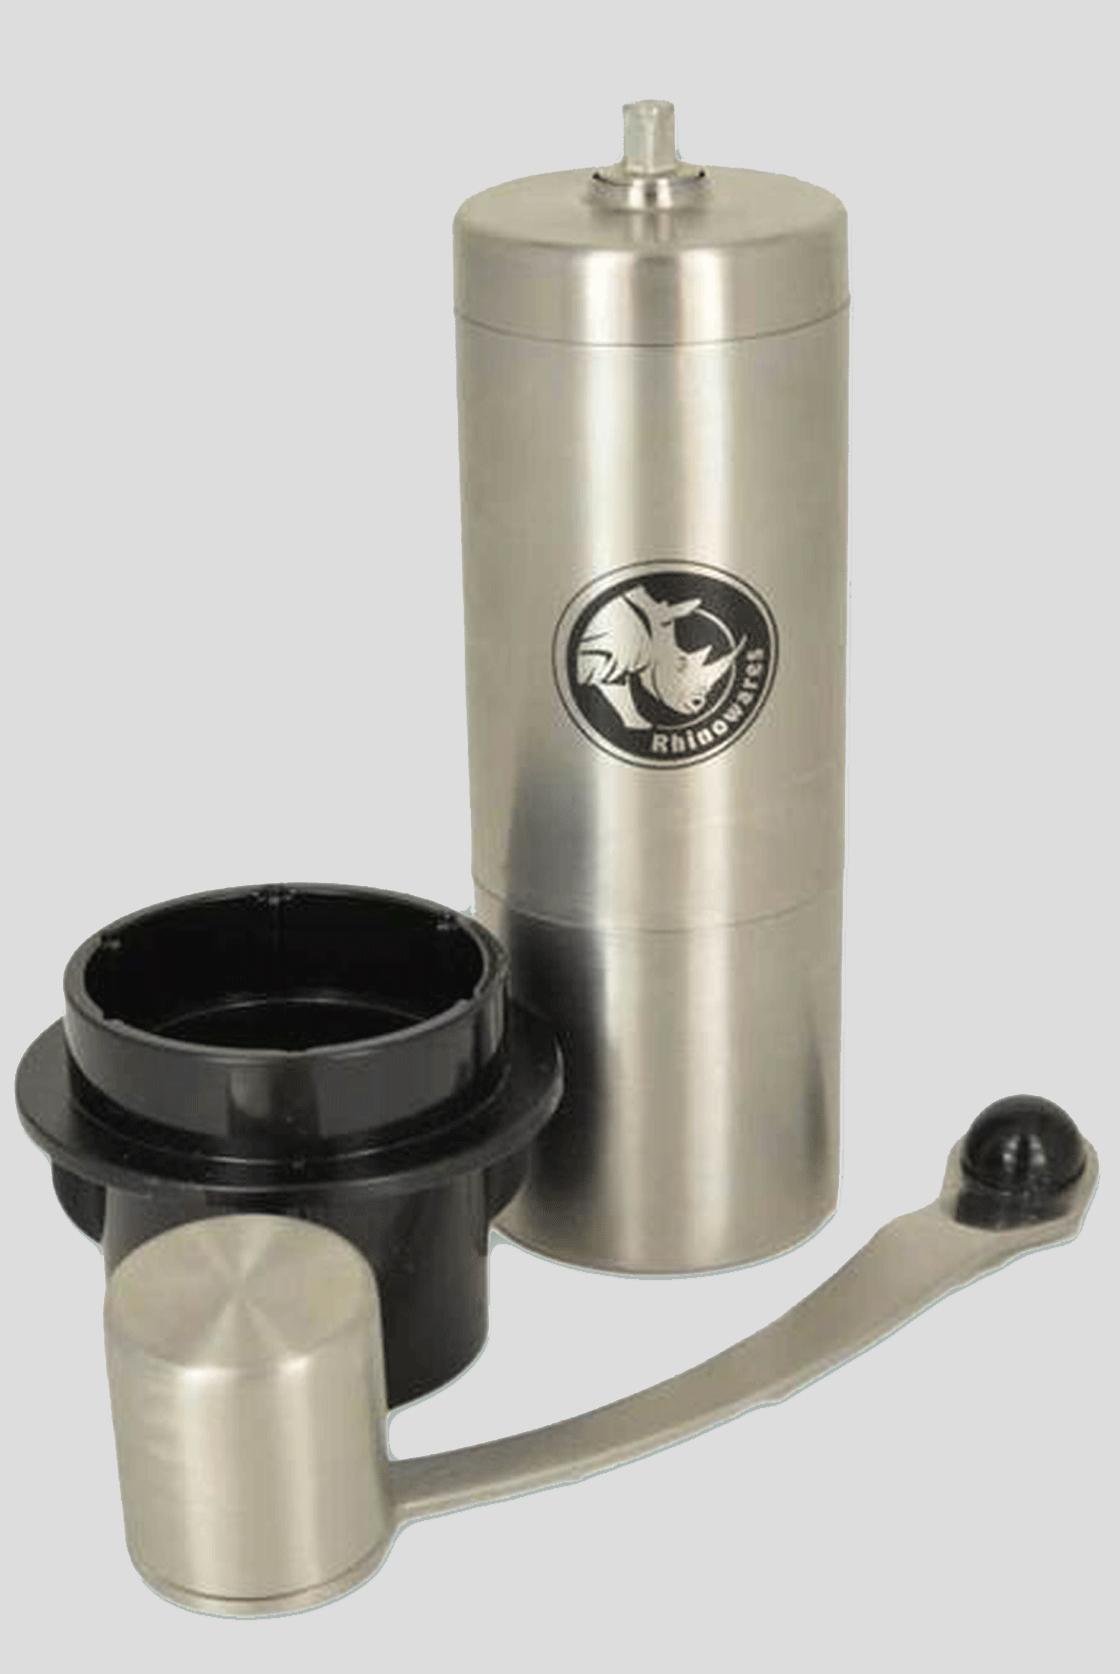 Rhino Hand Coffee Grinder